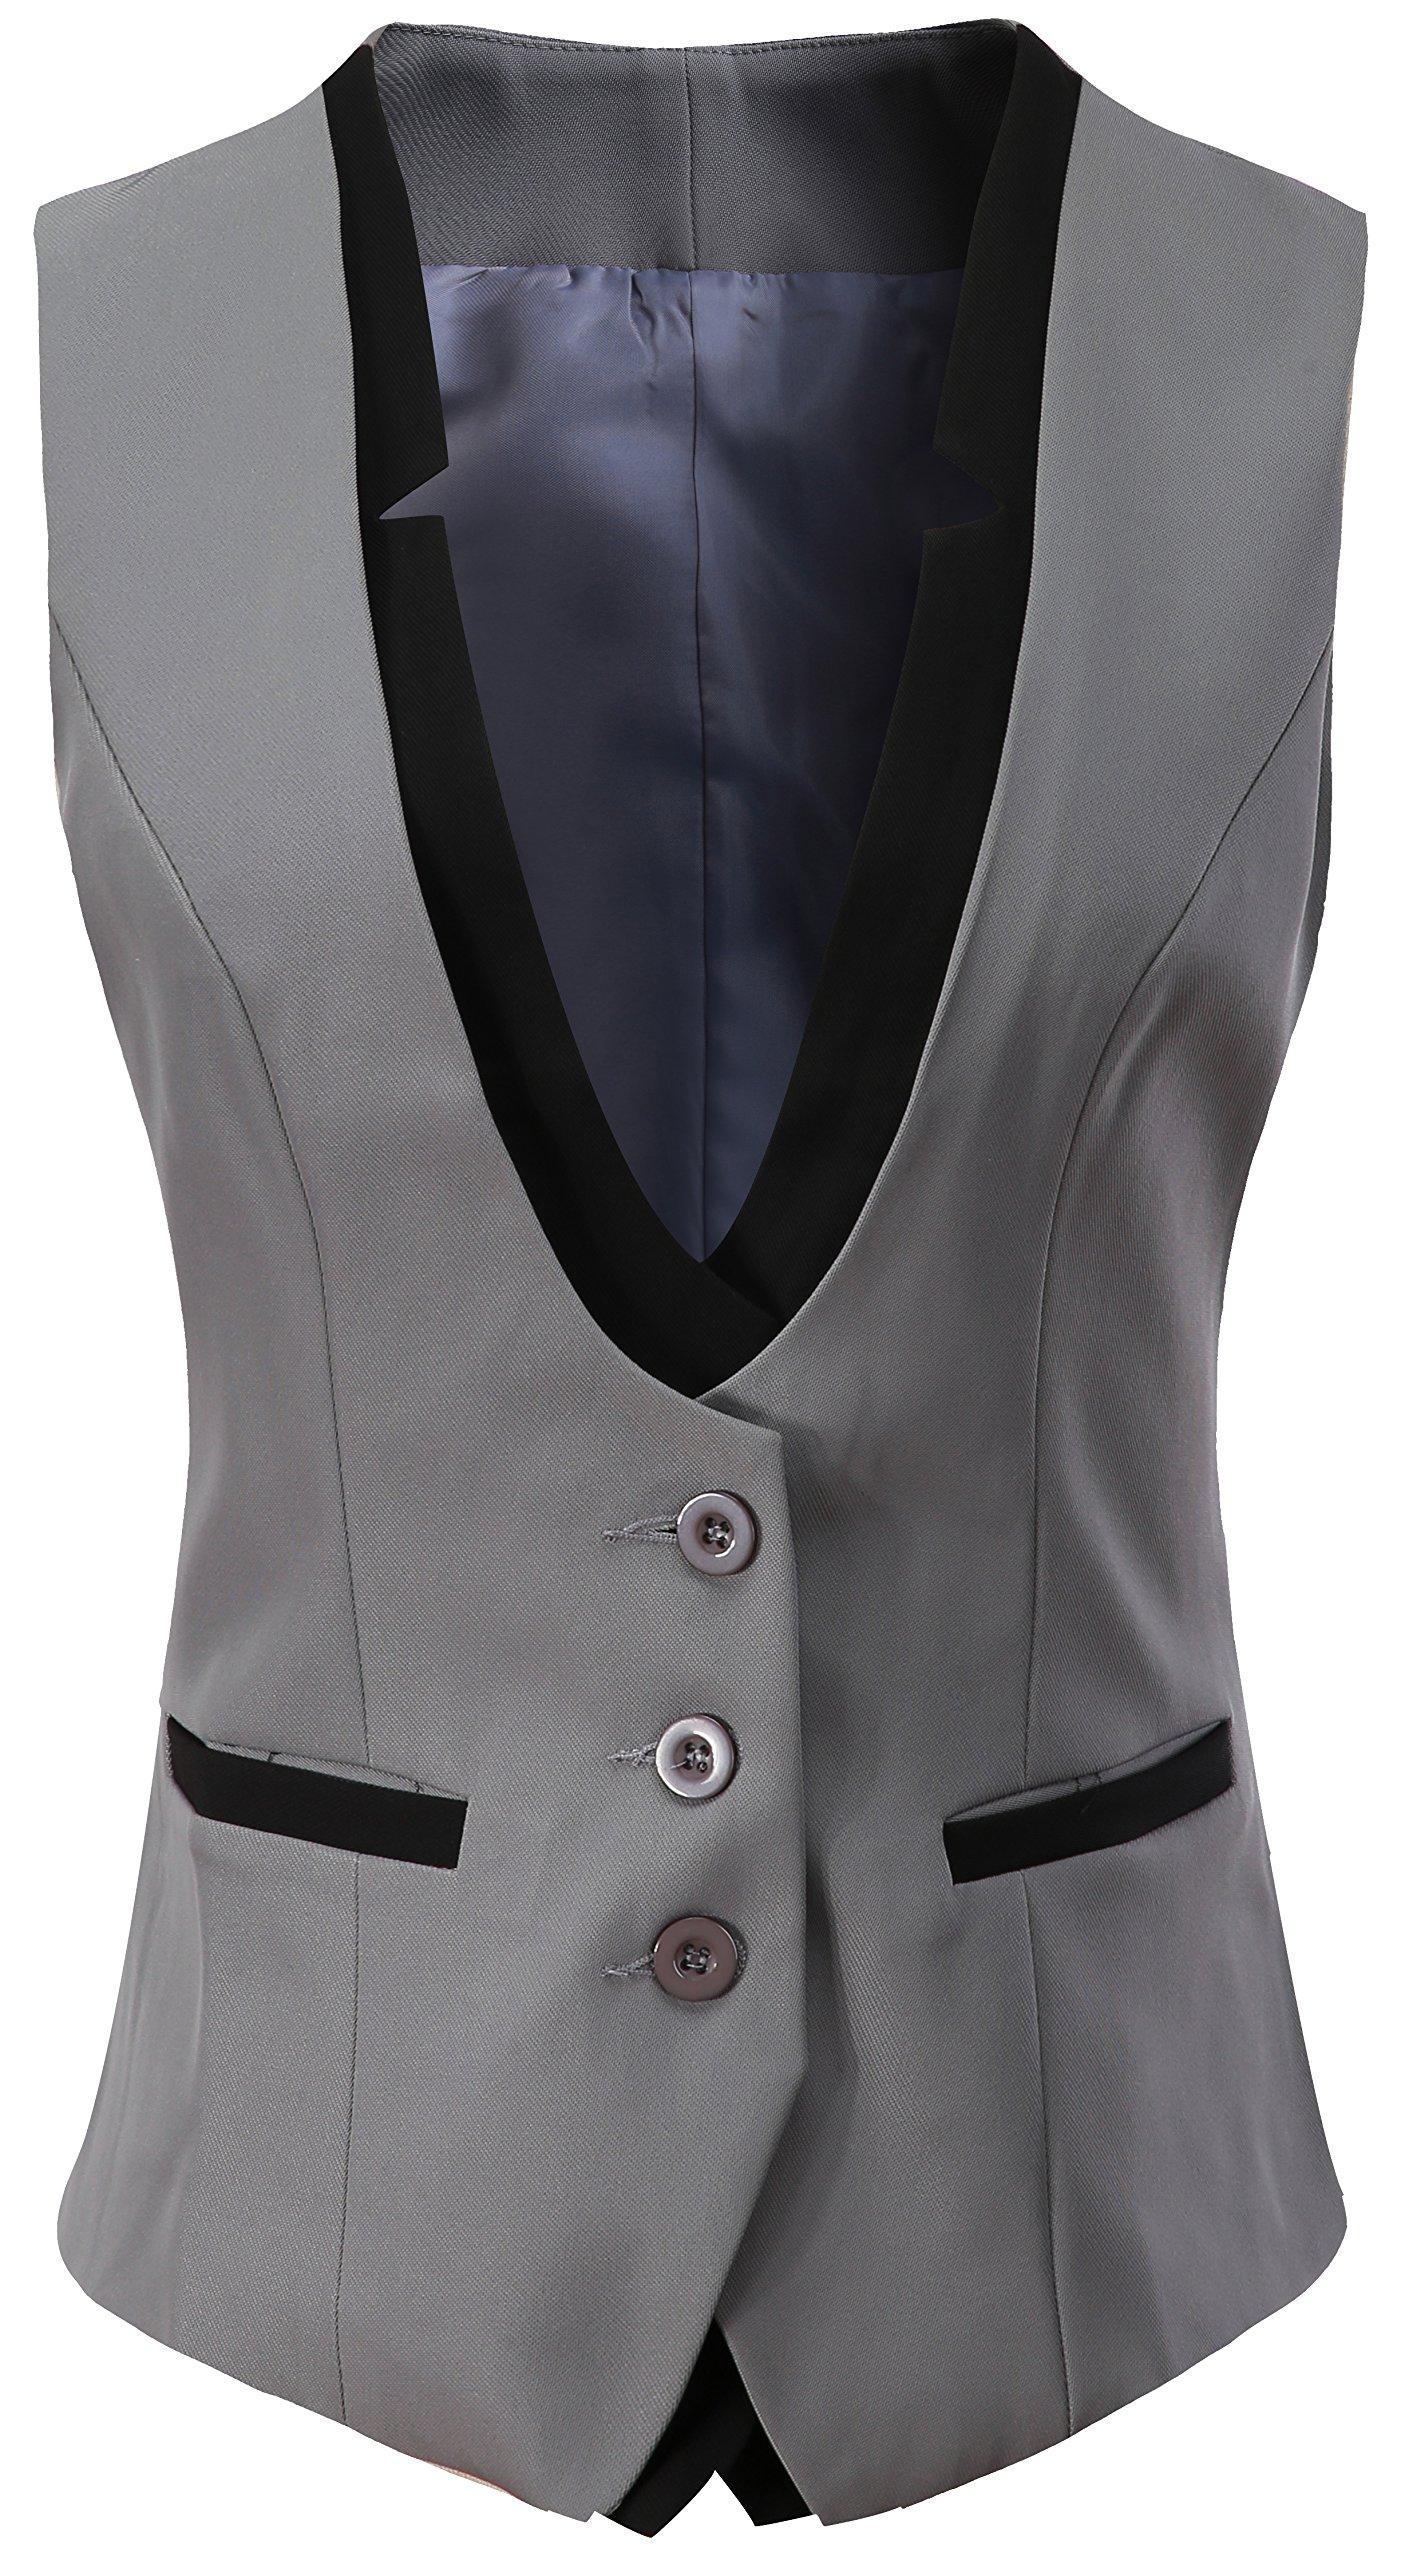 Vocni Women V-Neck Slim Fit Business Office Bottoned Dressy Suit Vest Waistcoat,Grey,US M (Fit Bust 35''-37.4''),Tag 3XL